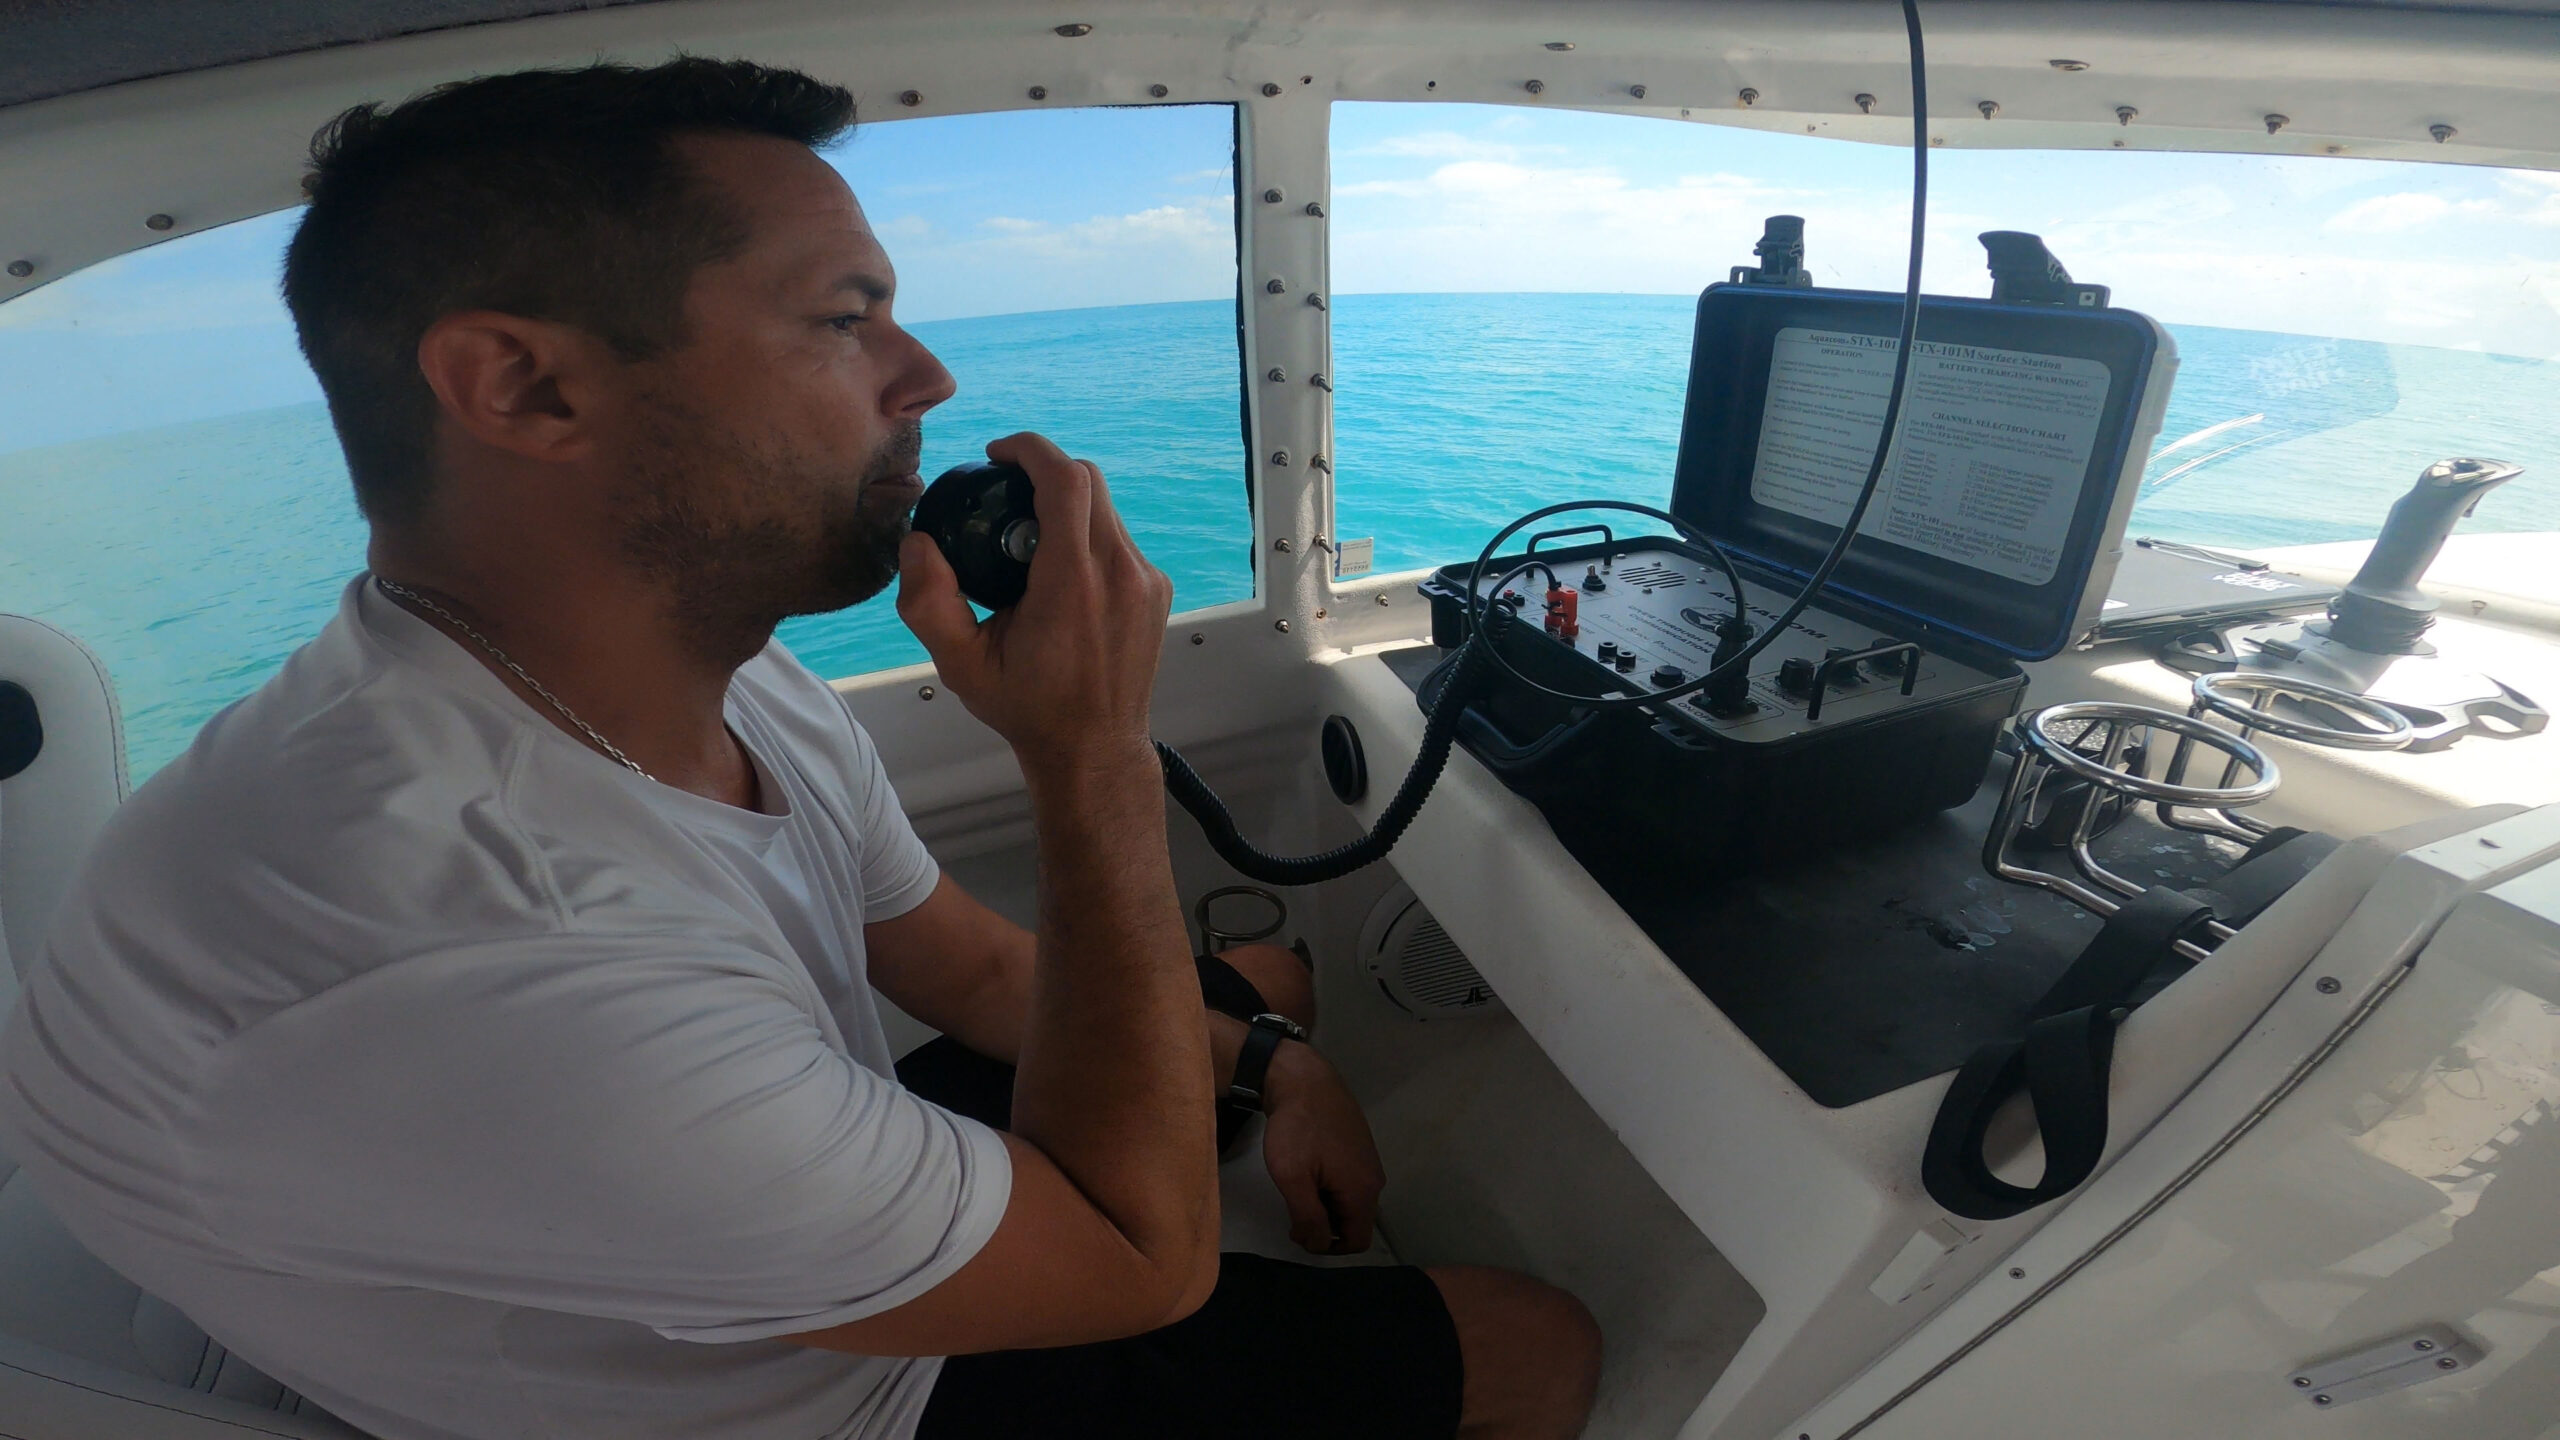 Seafarer-Exploration-SeaSearcher-Hydro-Probe-Coins-5-scaled